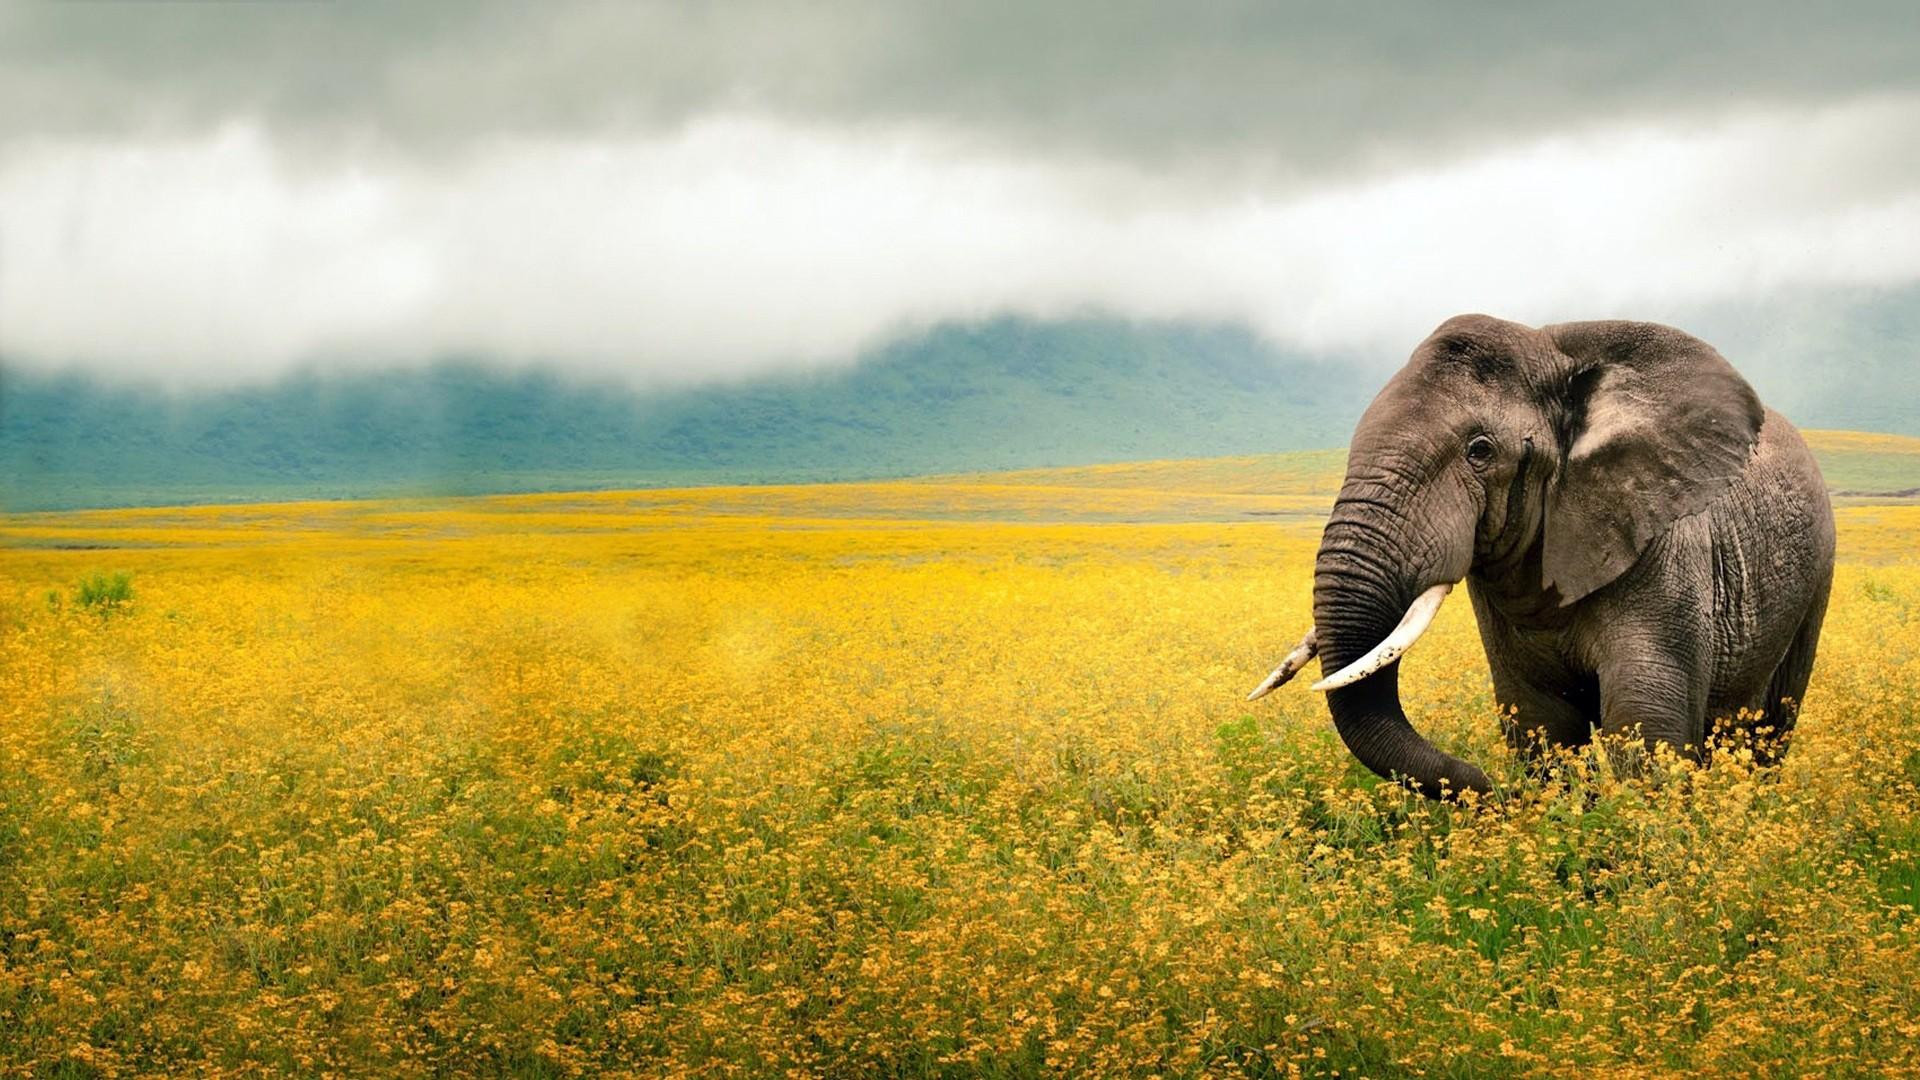 Elephant Full HD Wallpaper hd background hd screensavers hd wallpaper 1920p  1080p wallpaper full size images